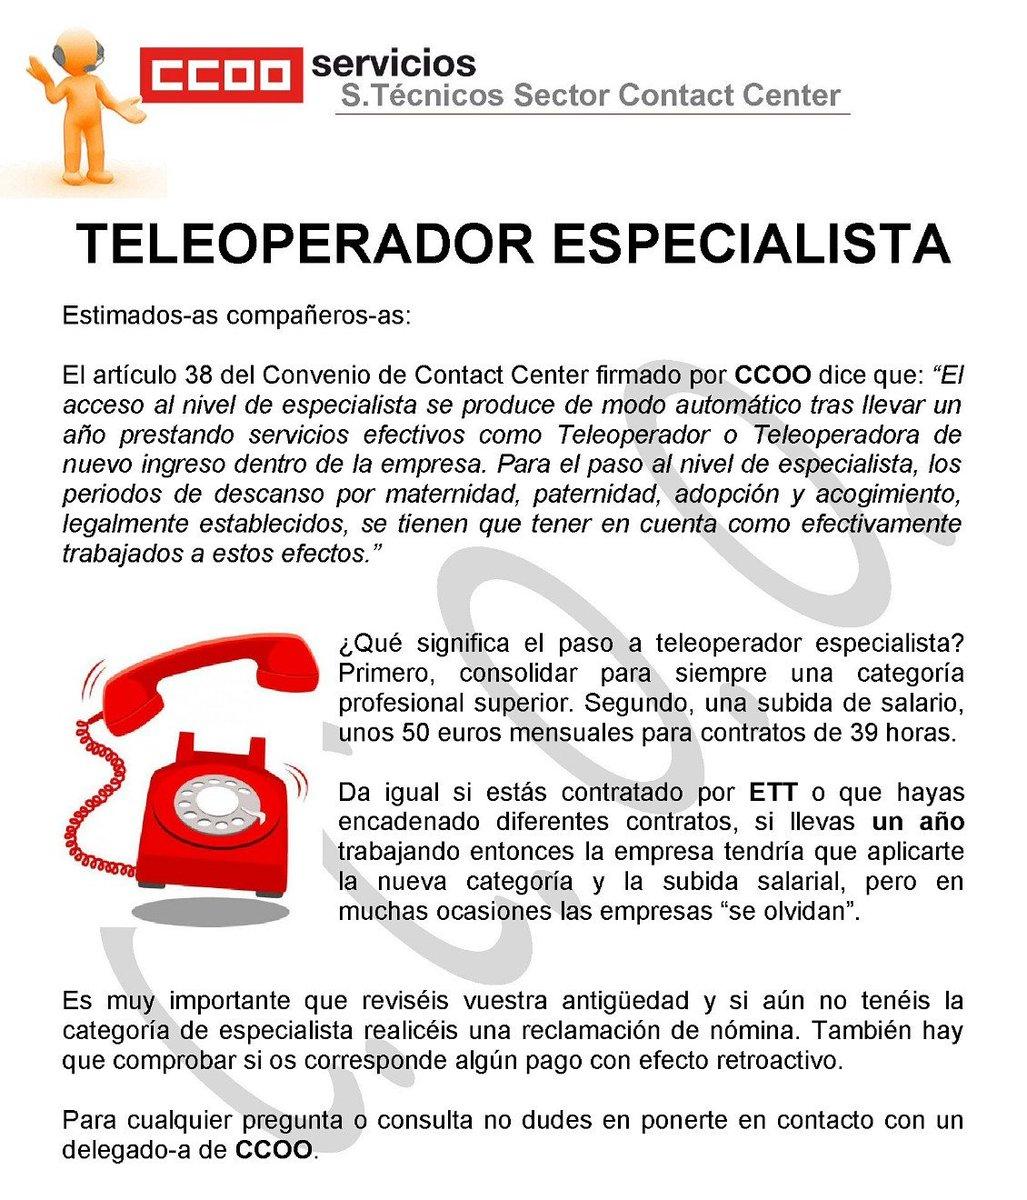 Teleoperador especialista